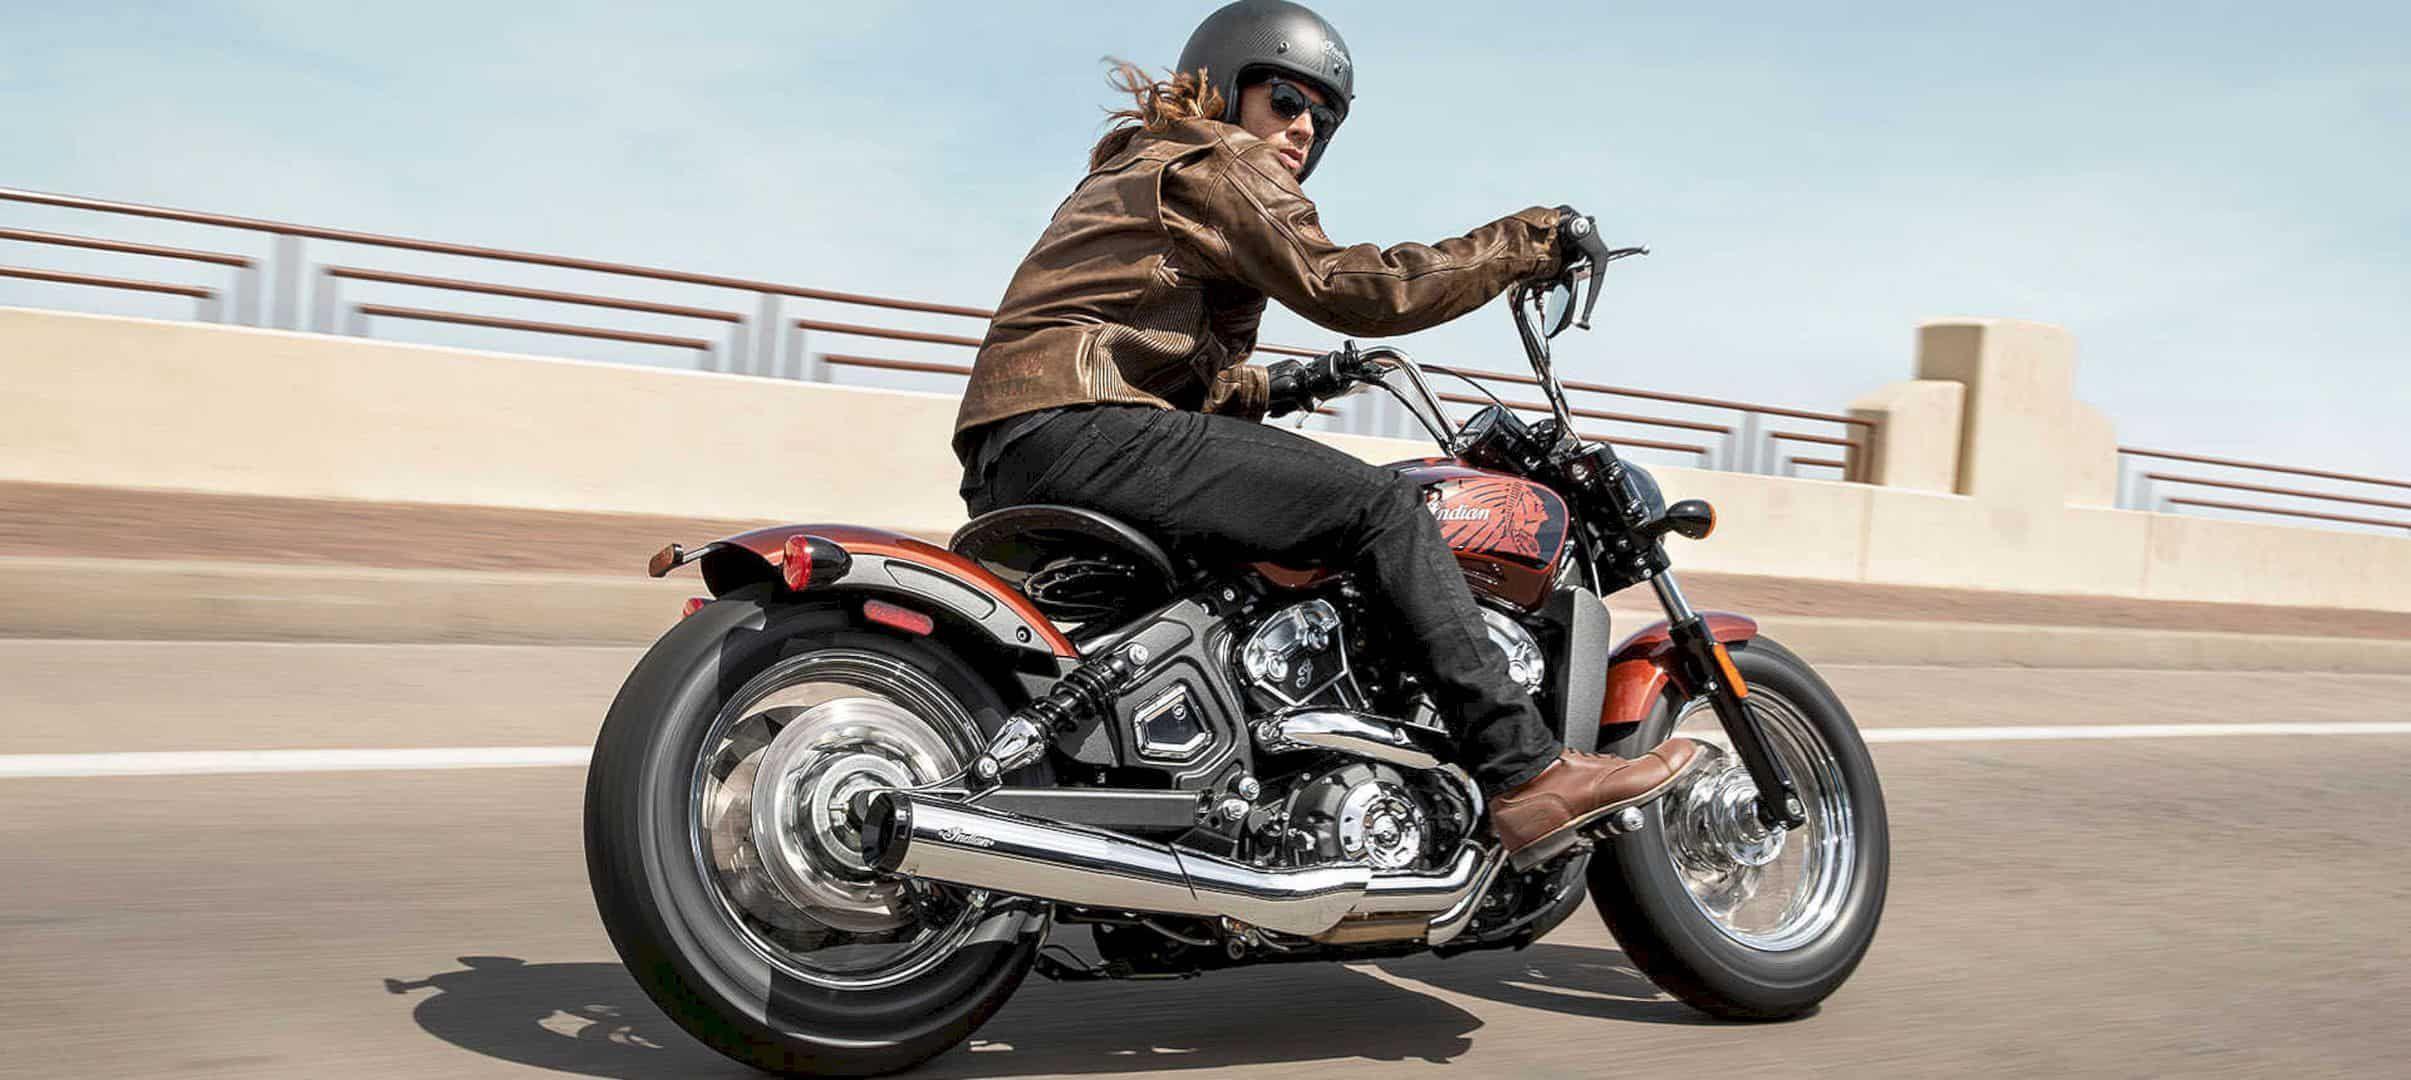 Indian Scout Bobber Twenty Motorcycle Indian Motorcycle Indian Scout Bobber [ 1080 x 2411 Pixel ]